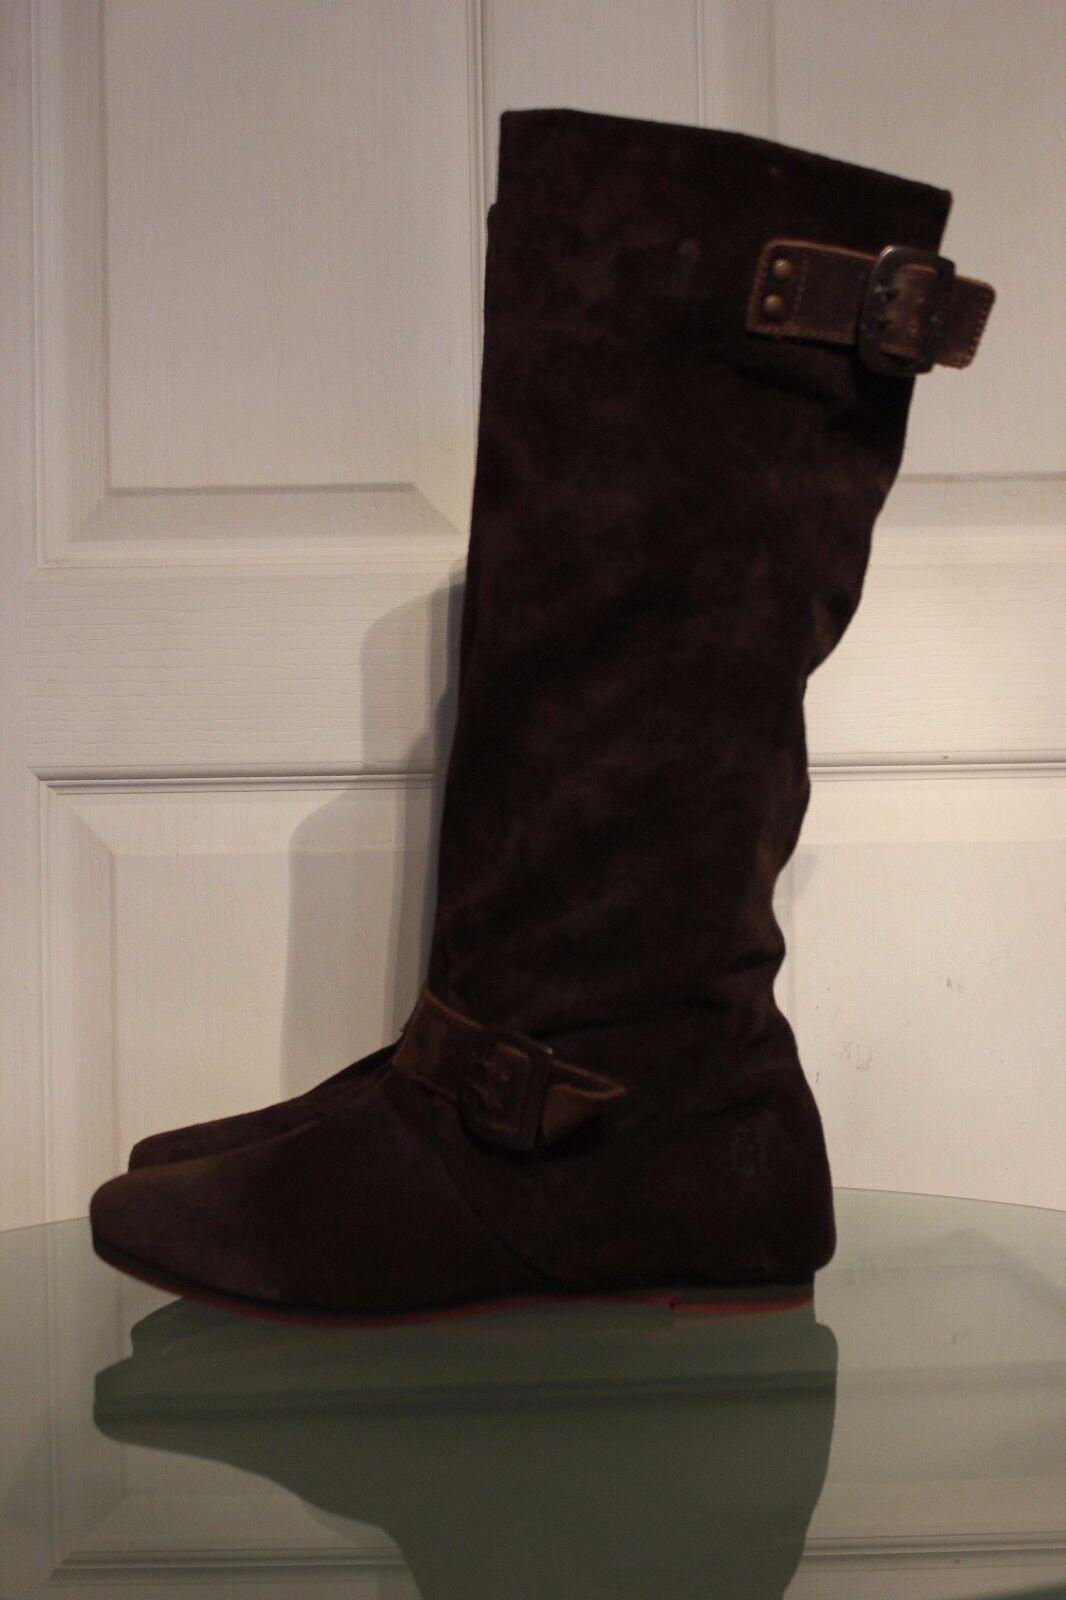 FLY LONDON Dark Braun Suede Mid-Calf Pull On Stiefel, UK7/EUR40, VGC